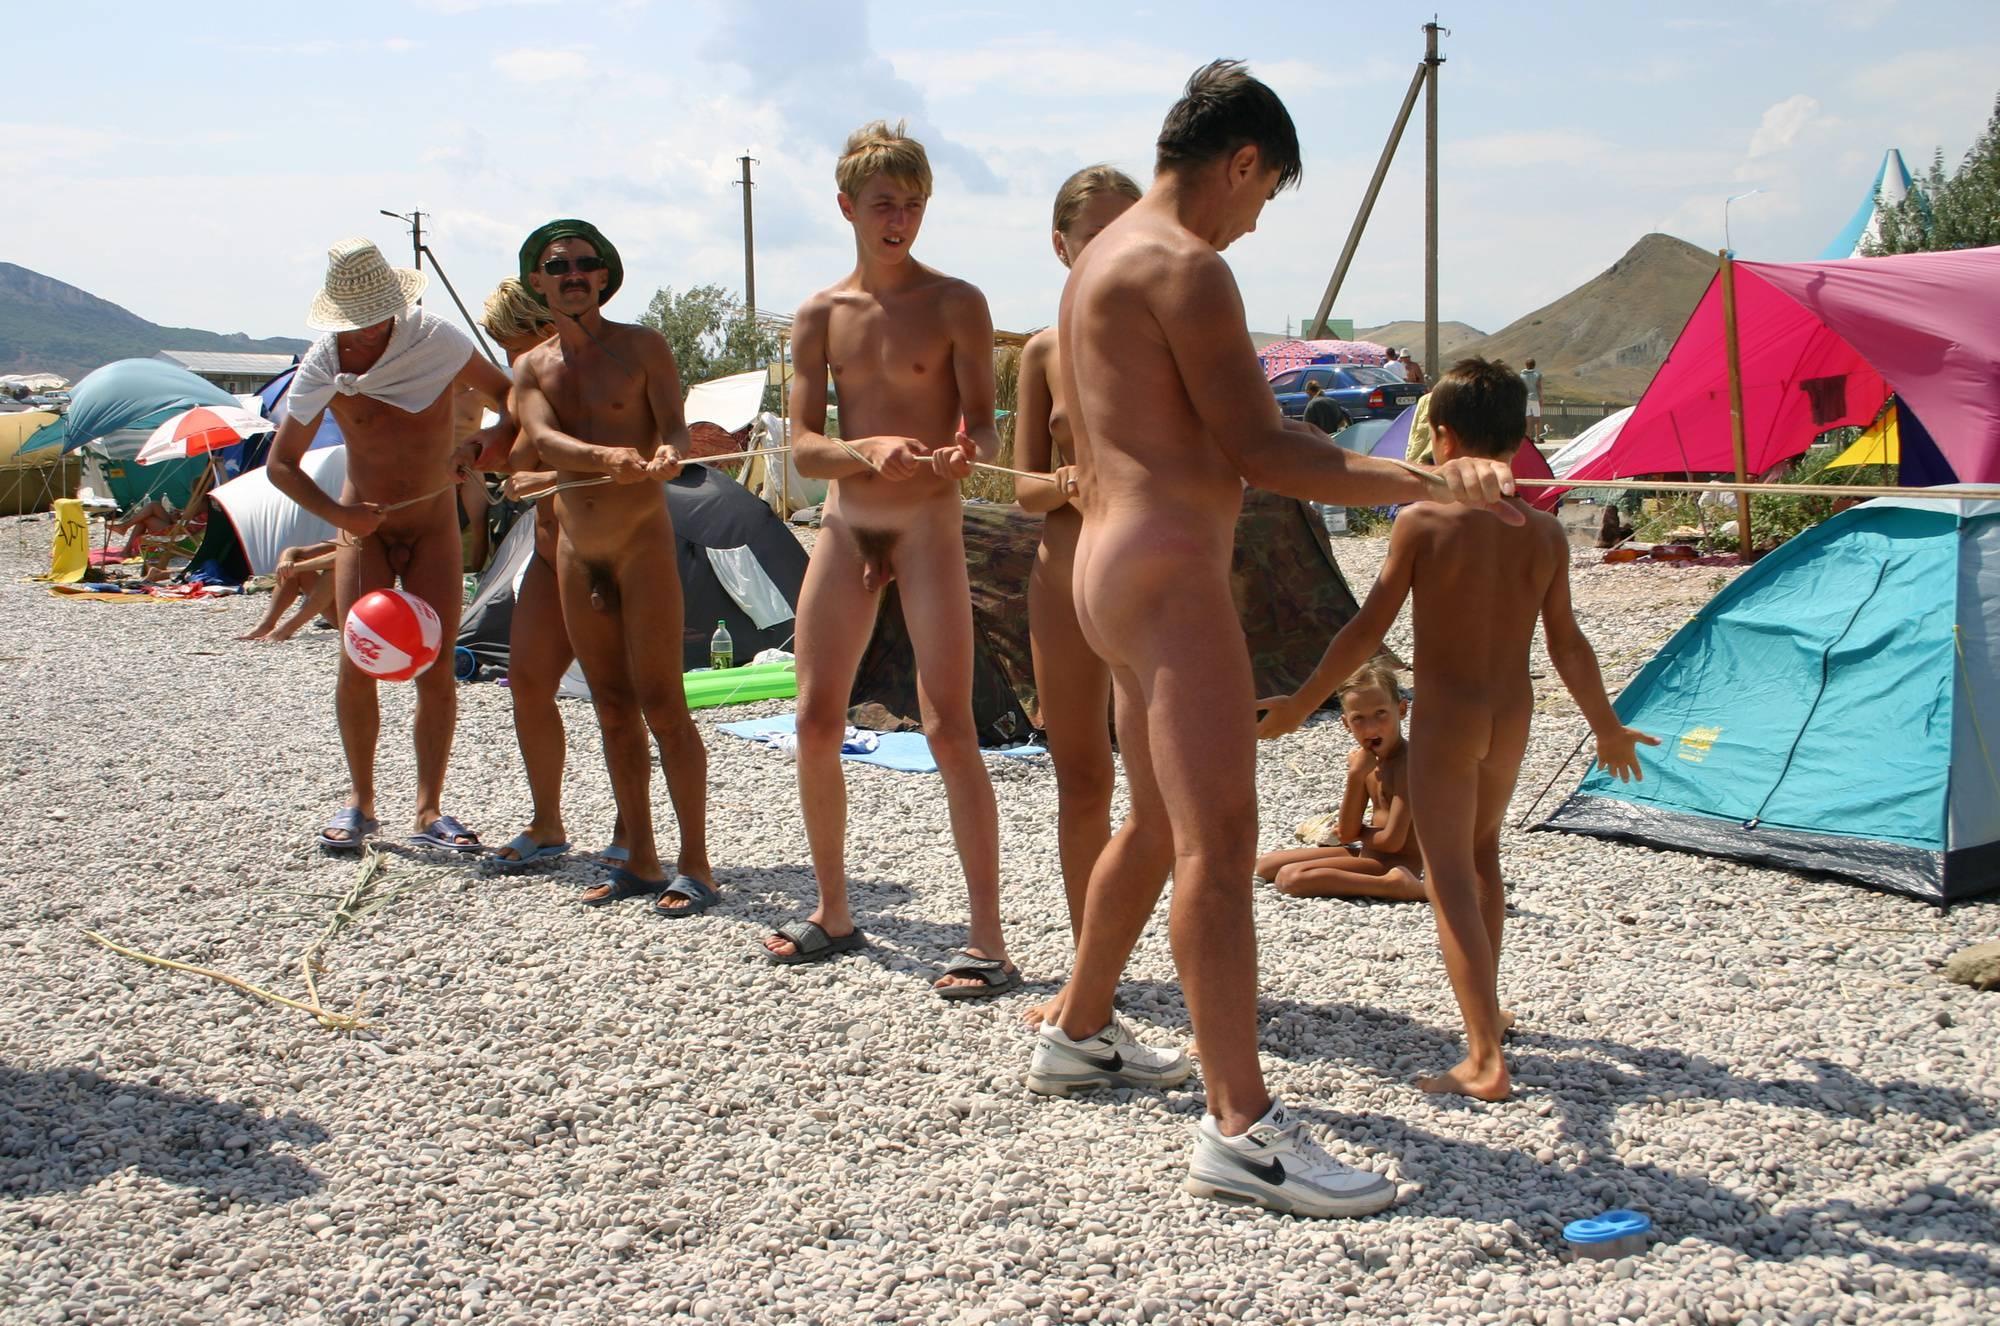 Nudist Pictures Naturist Kids Tug of War - 2